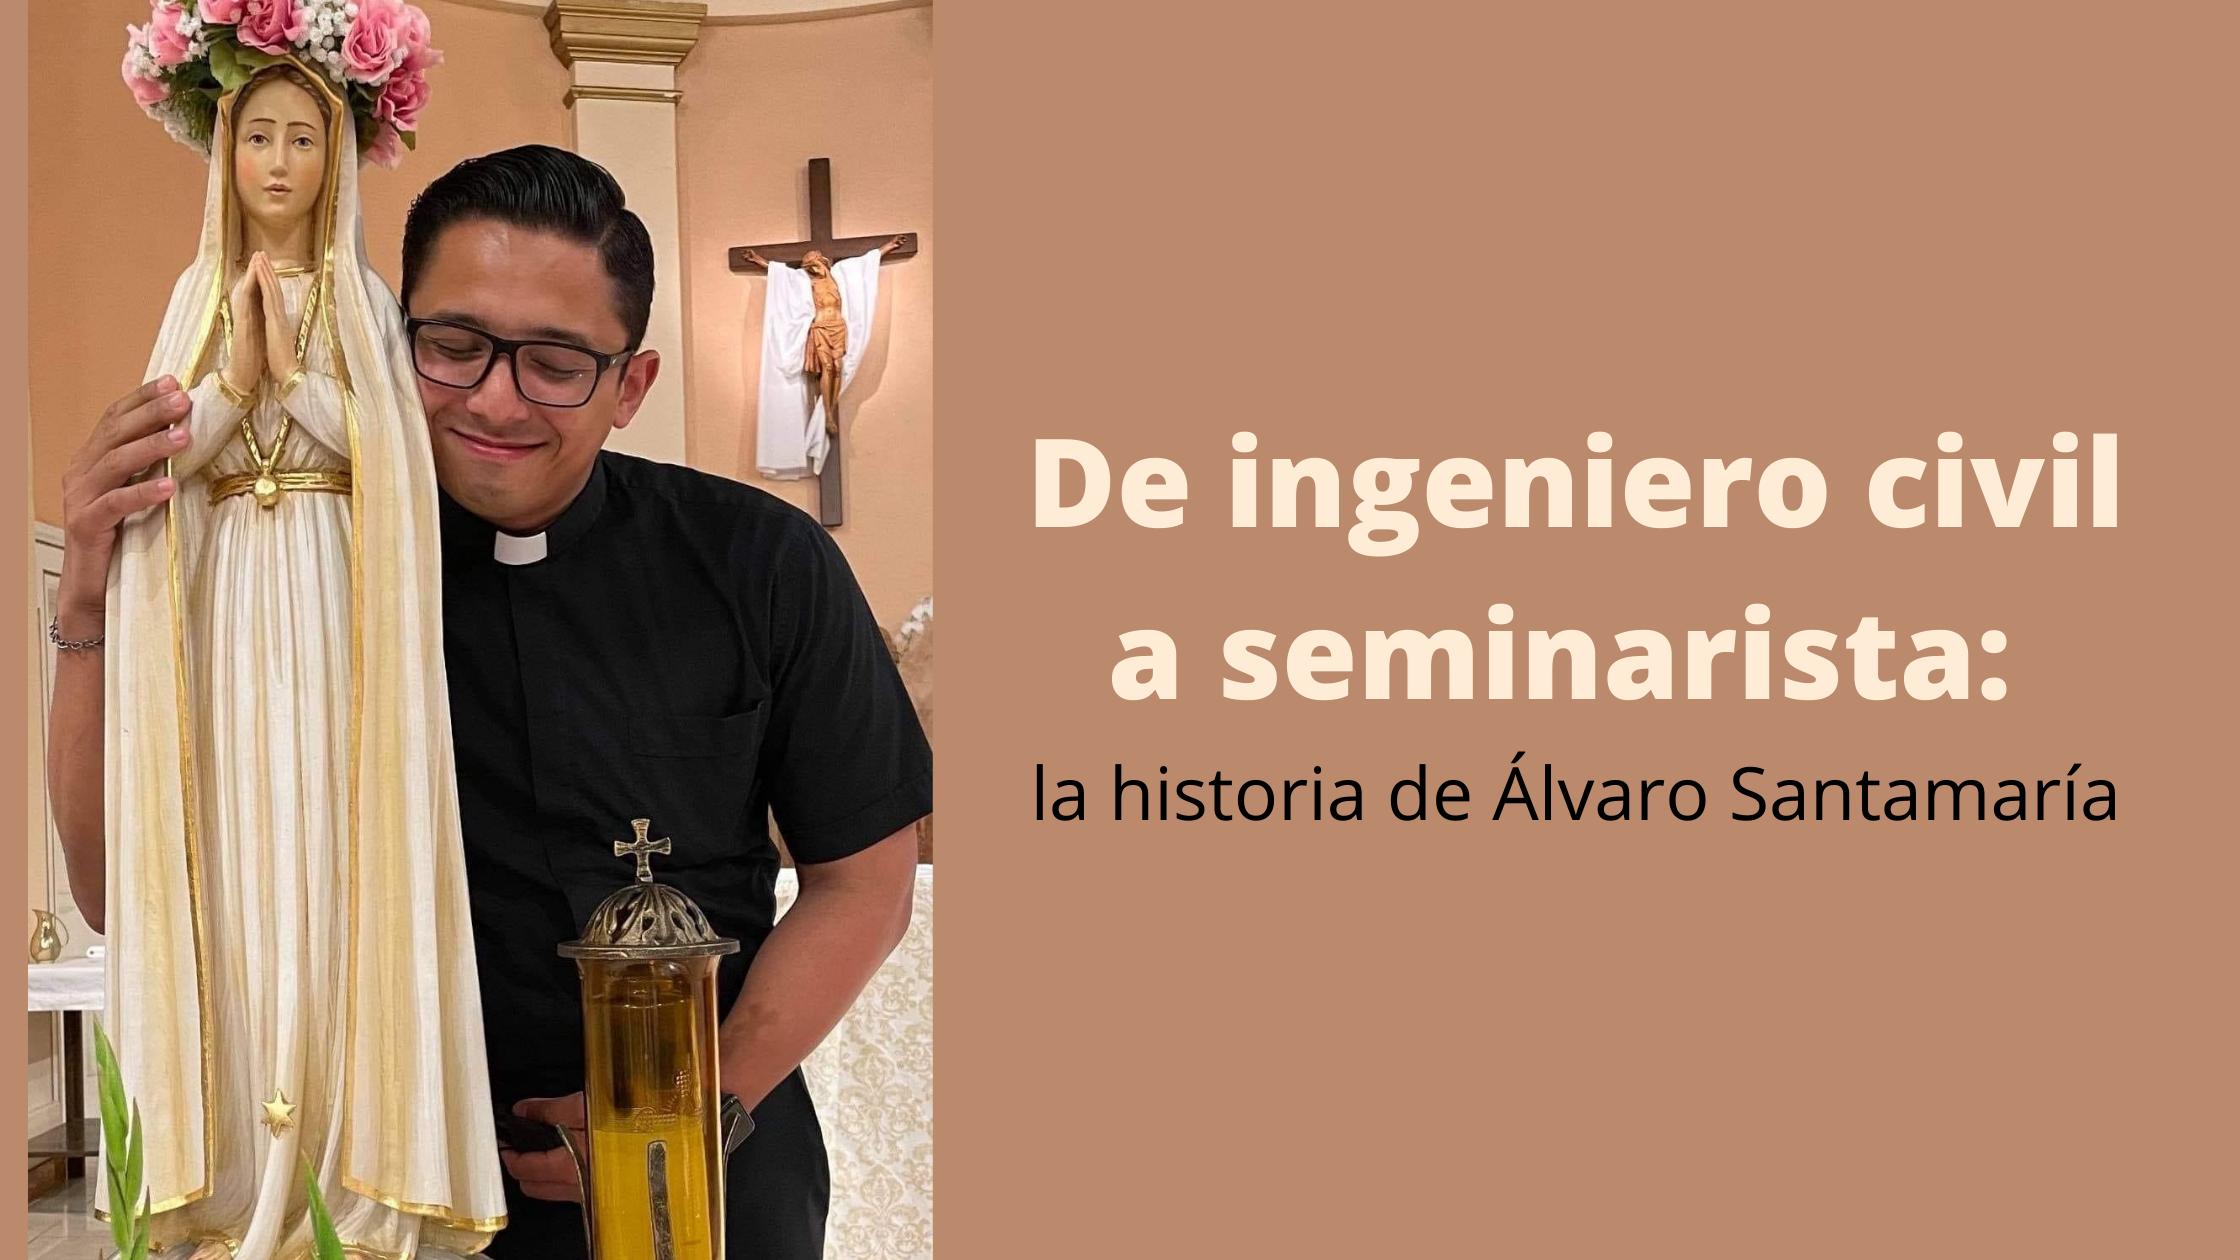 Civil Engineer To Seminarian Espanol   Blog